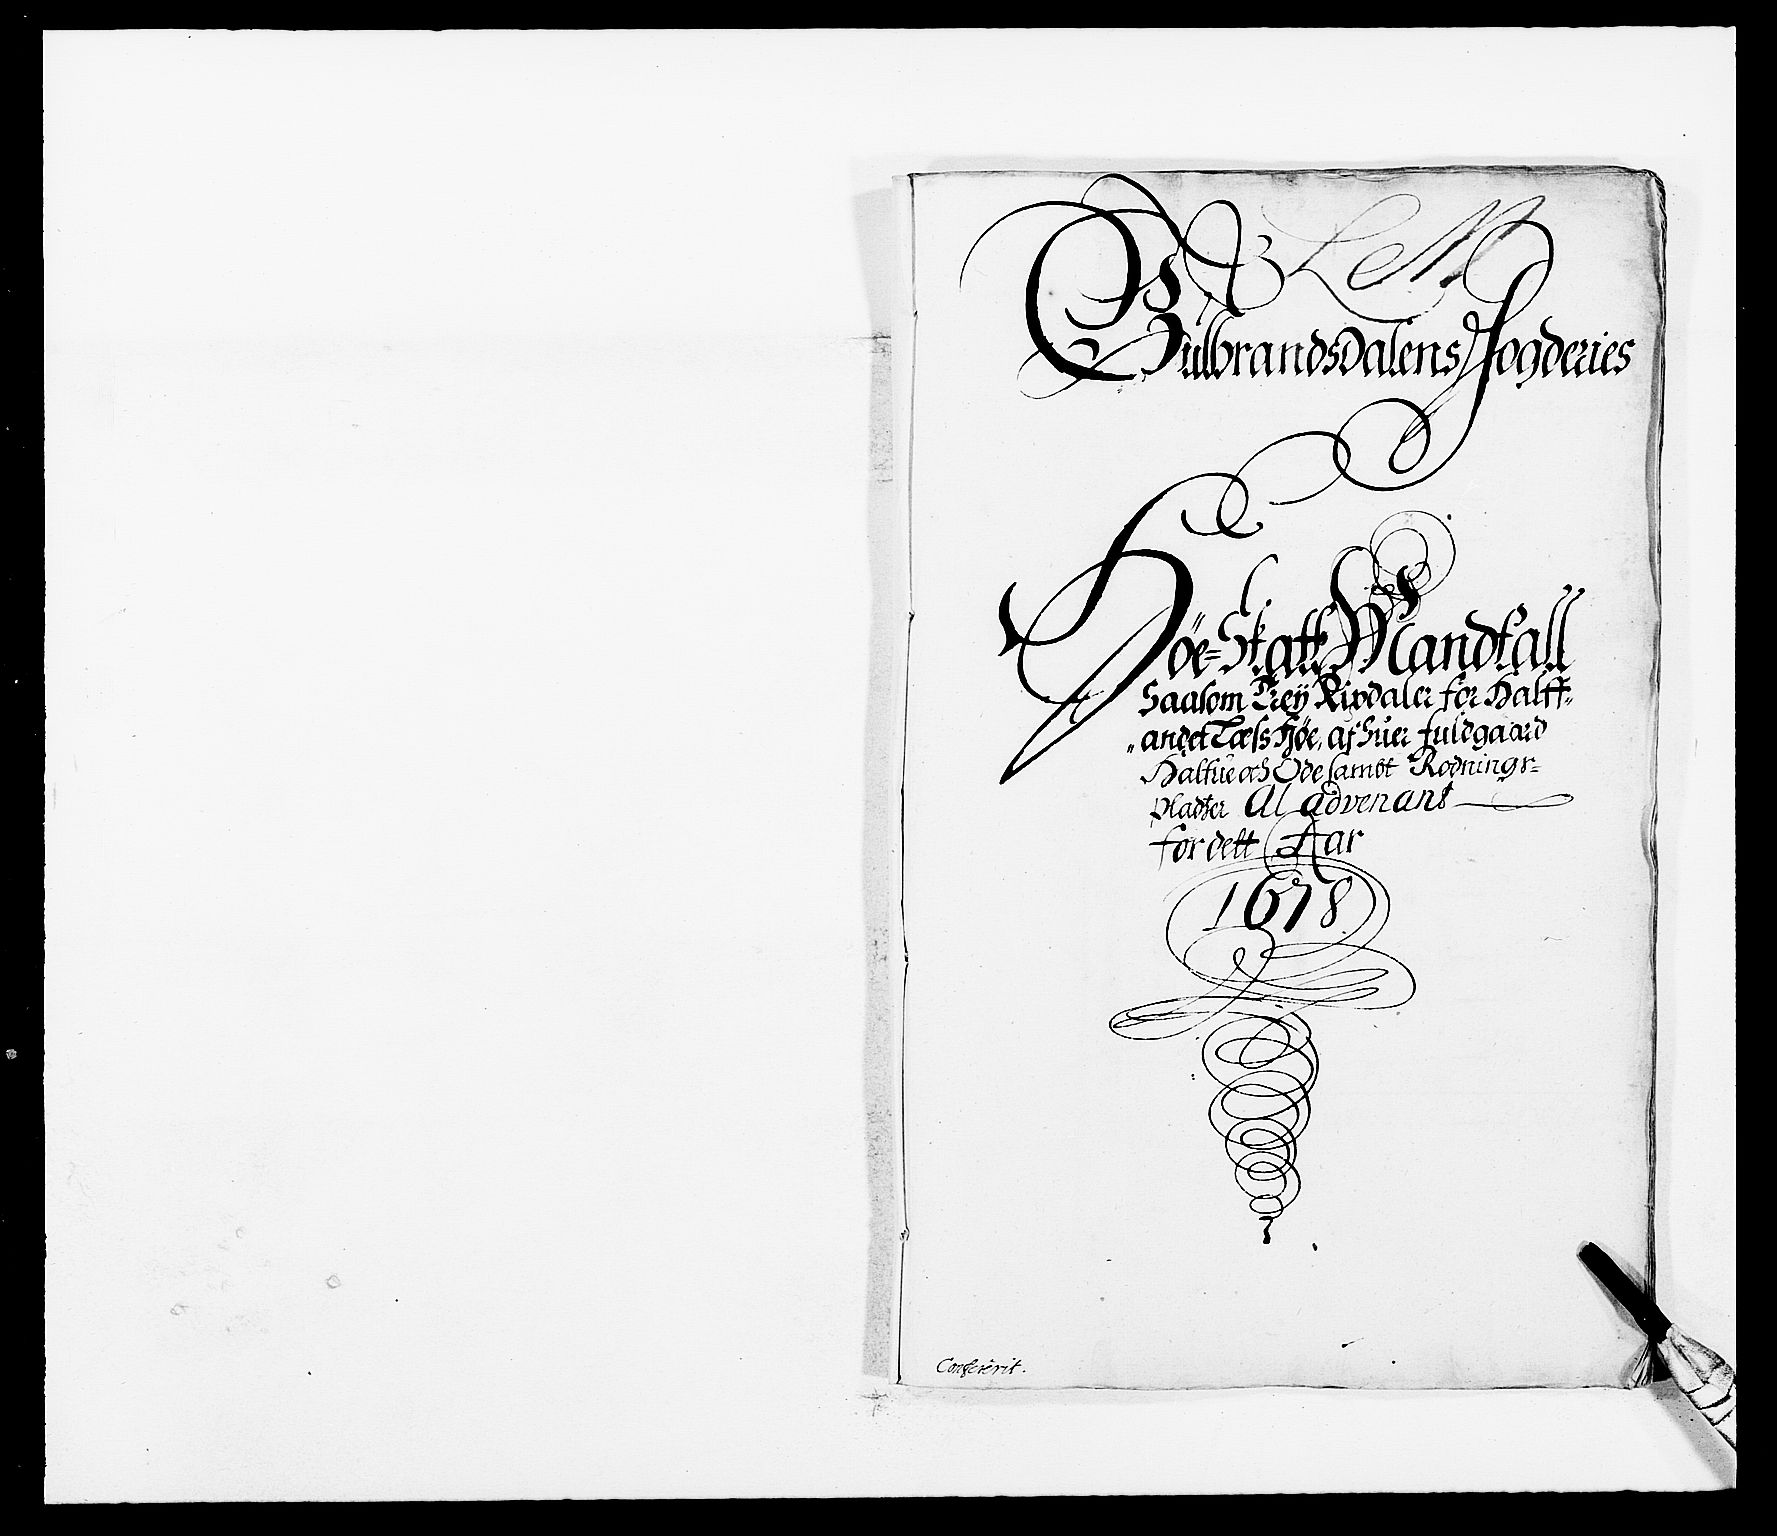 RA, Rentekammeret inntil 1814, Reviderte regnskaper, Fogderegnskap, R17/L1152: Fogderegnskap Gudbrandsdal, 1678-1679, s. 413